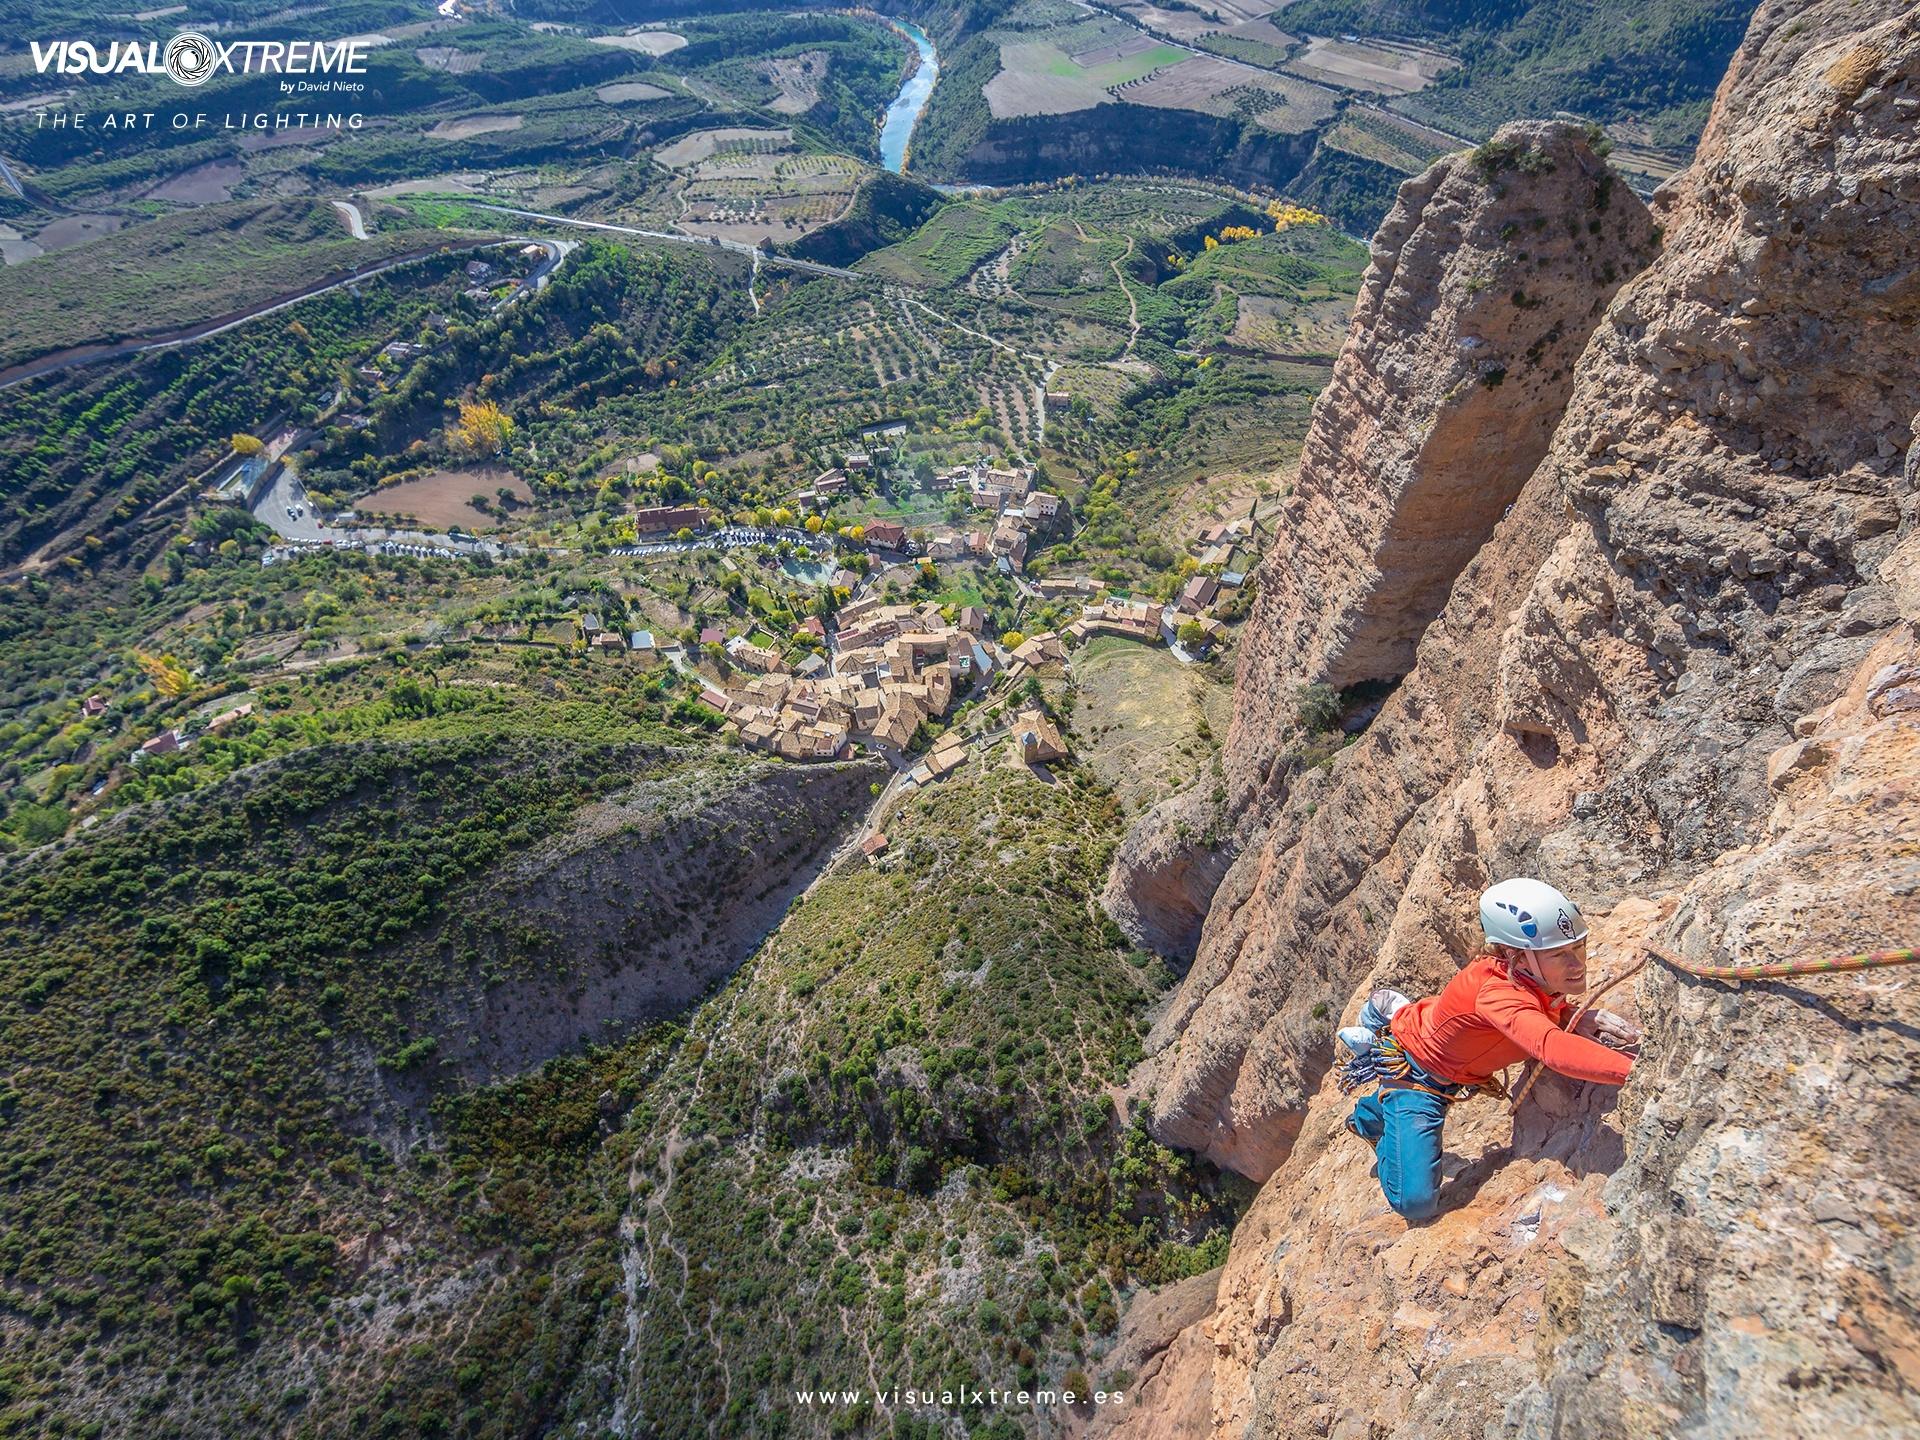 Lynn Hill on Mitigating Risk with Wilderness Medicine